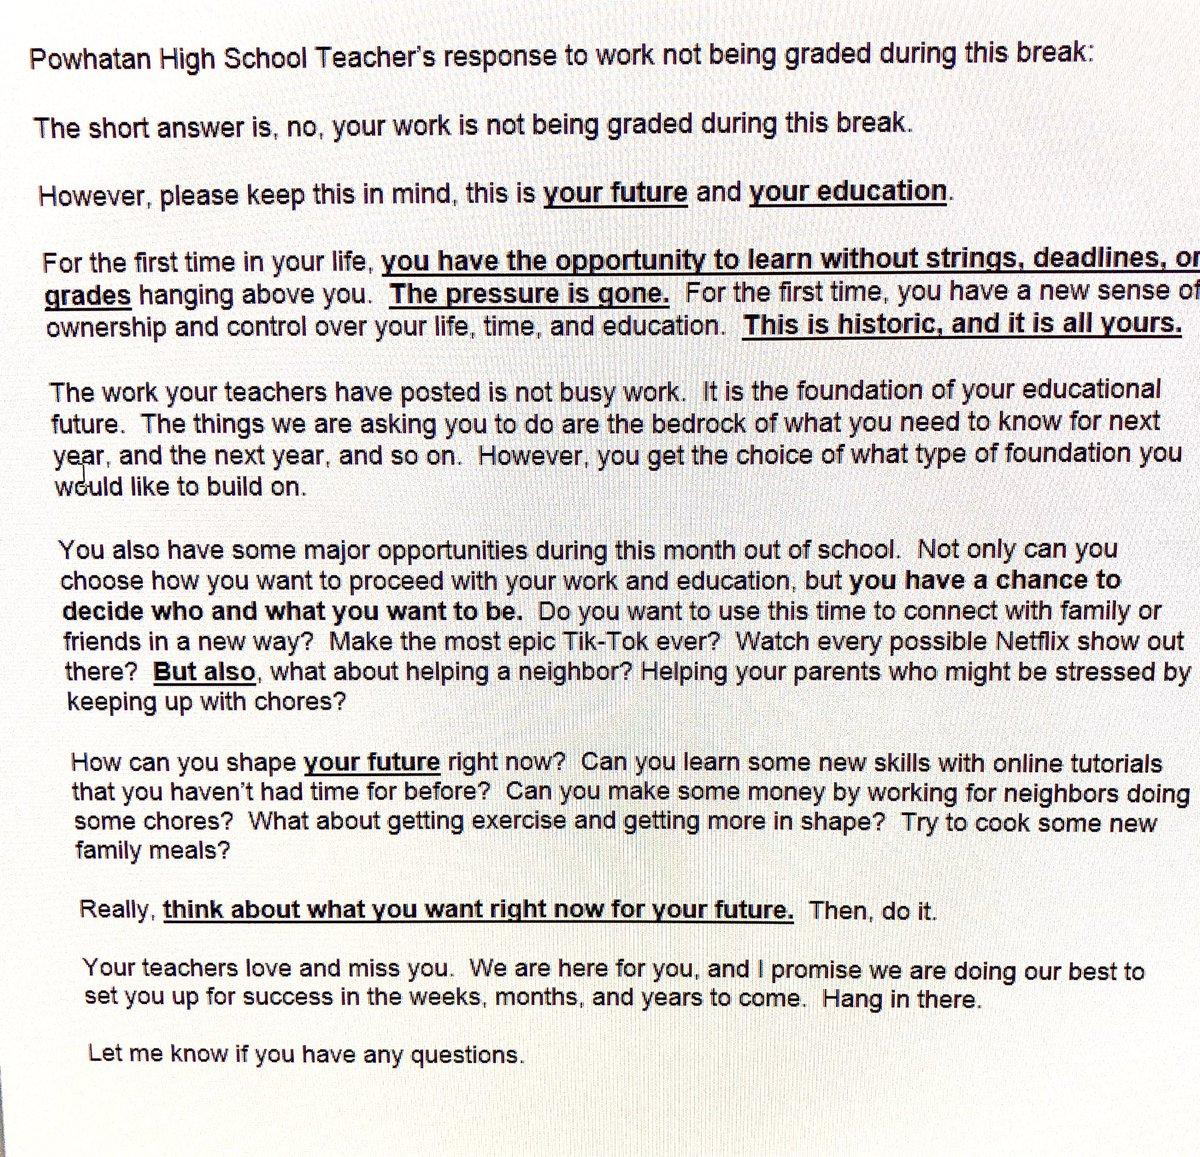 This @PowhatanHS teacher gets it! ❤️🖤🧡